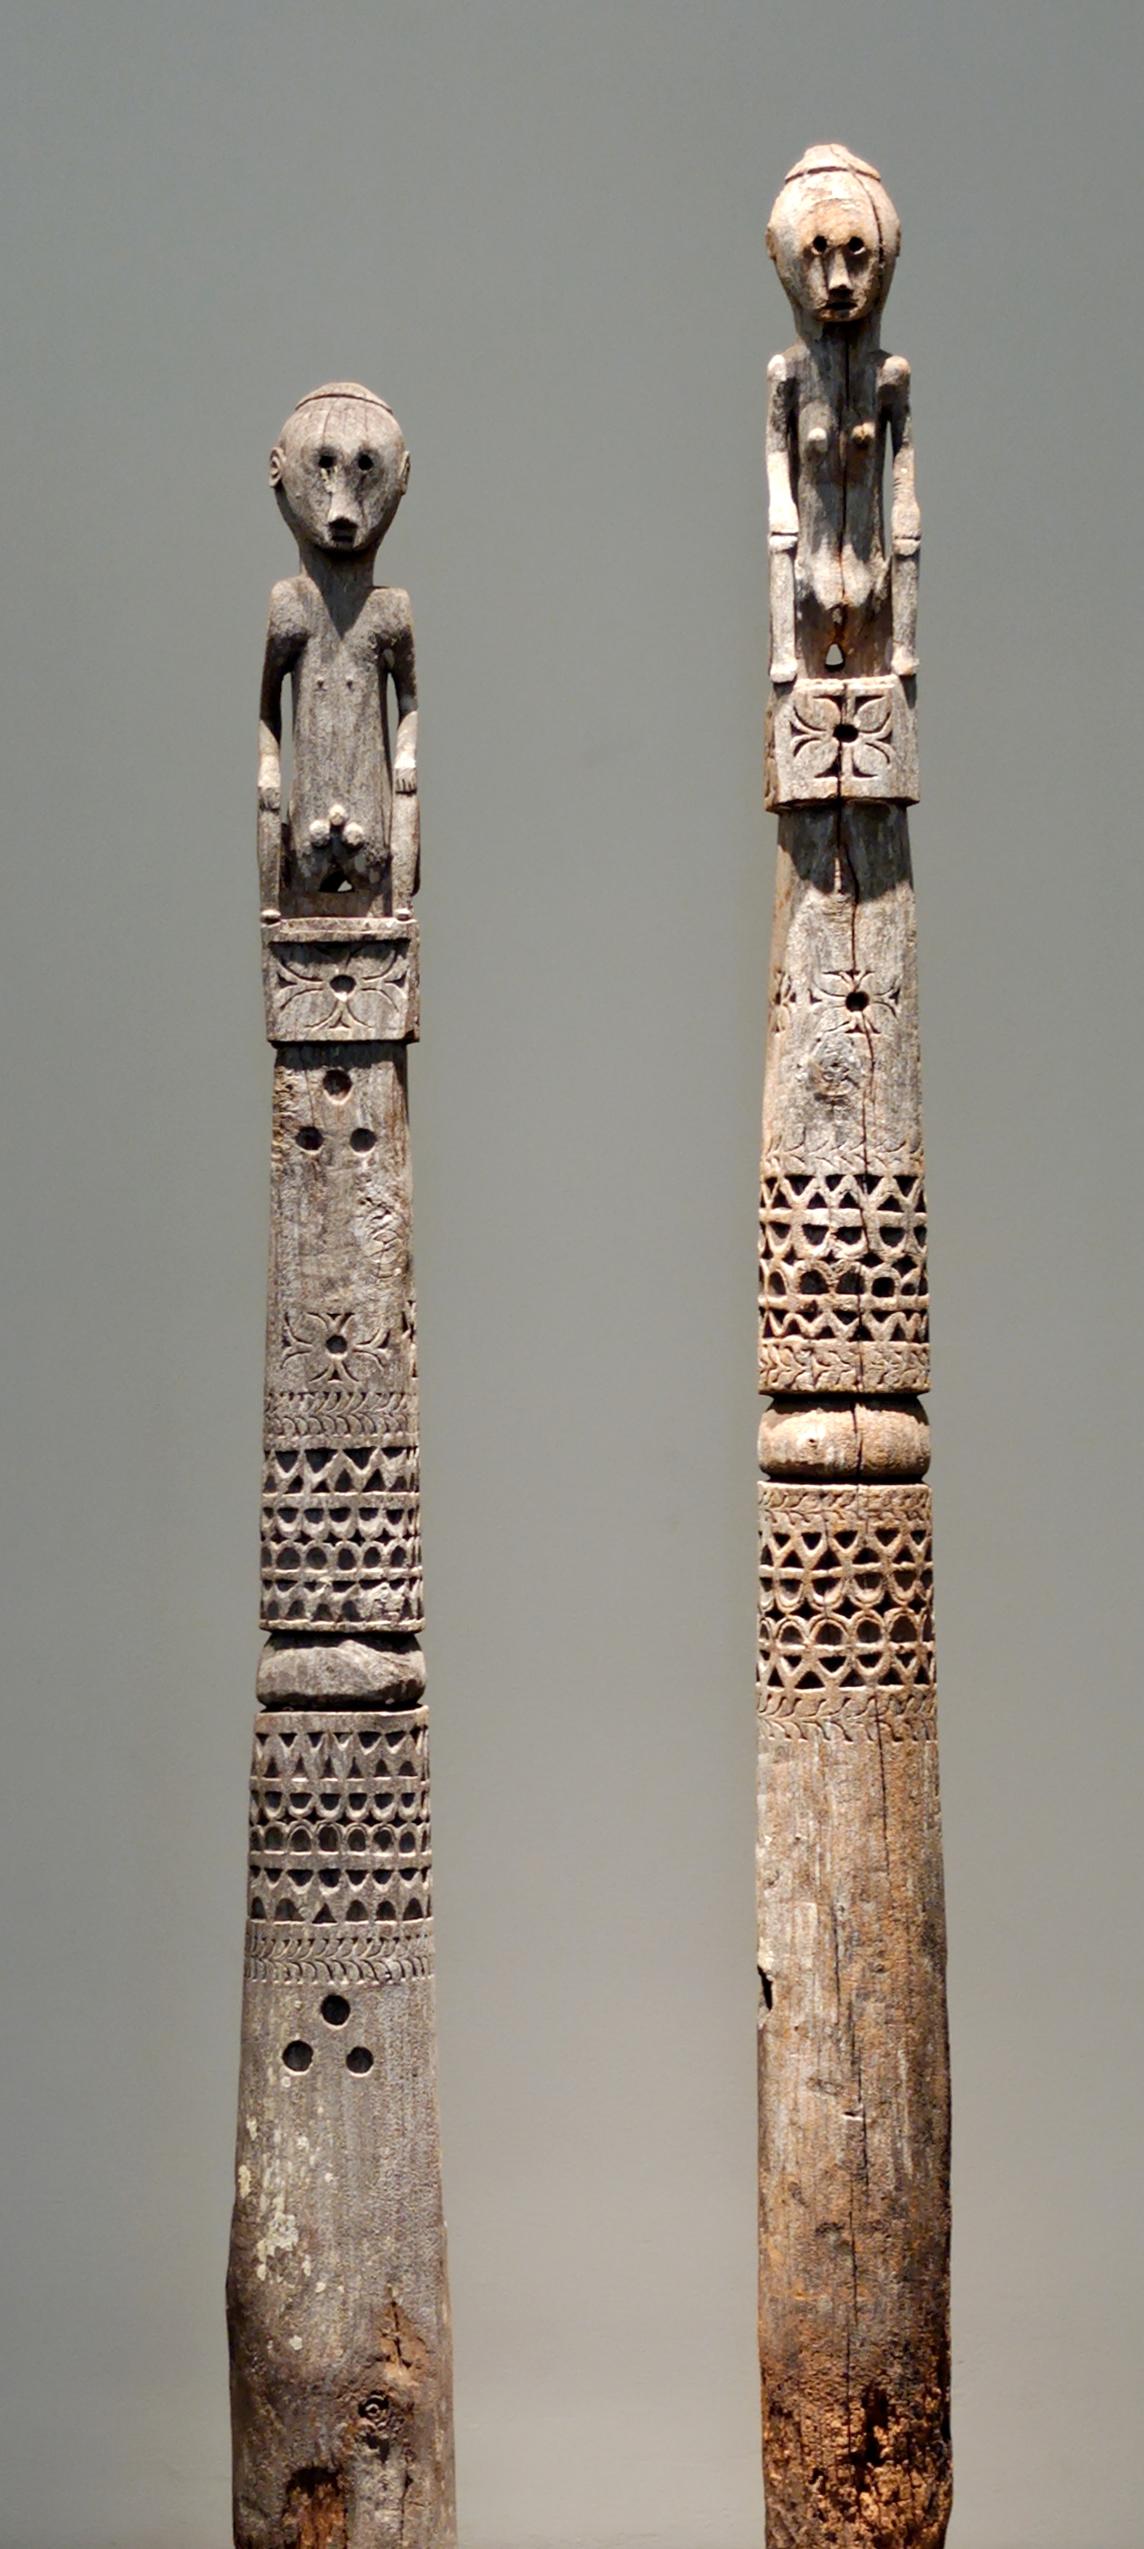 Pair of Ngada Ancestor Figure Posts |  Ana Deo  © Musée du Quai-Branly | France